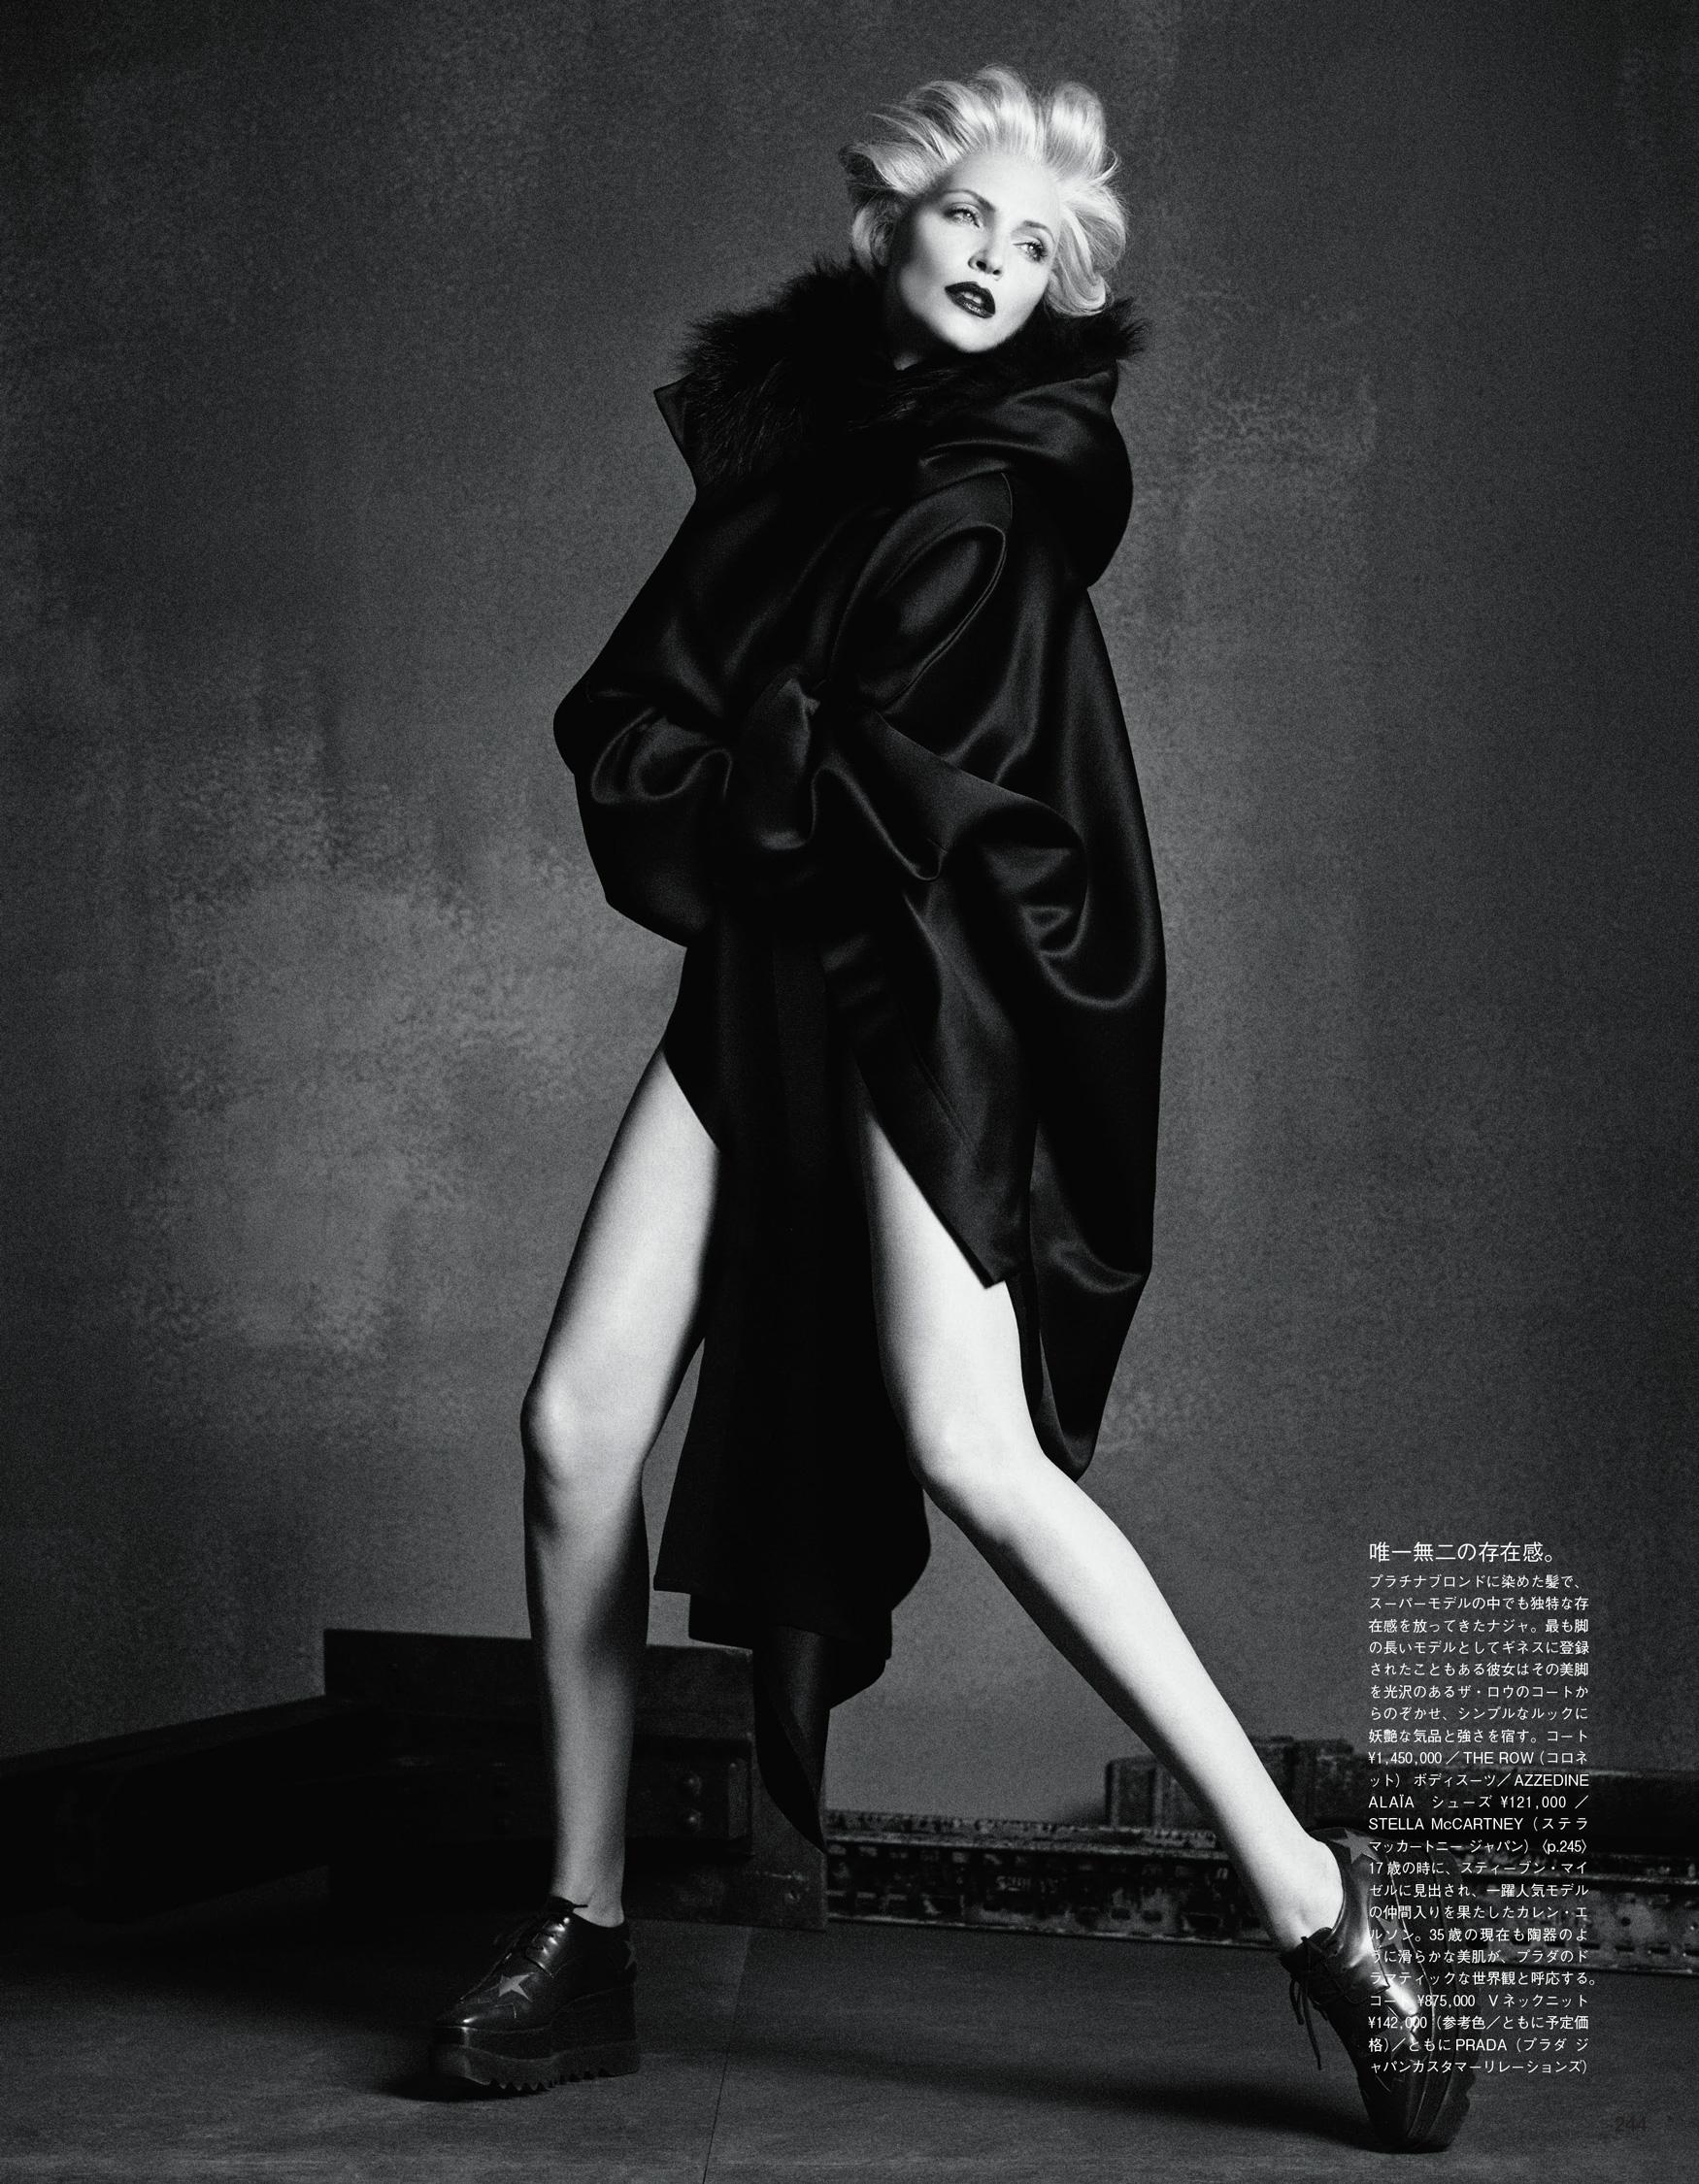 Giovanna-Battaglia-The-Icons-Of-Perfections-Vogue-Japan-15th-Anniversary-Issue-Luigi-Iango-V181_244_200-23.jpg